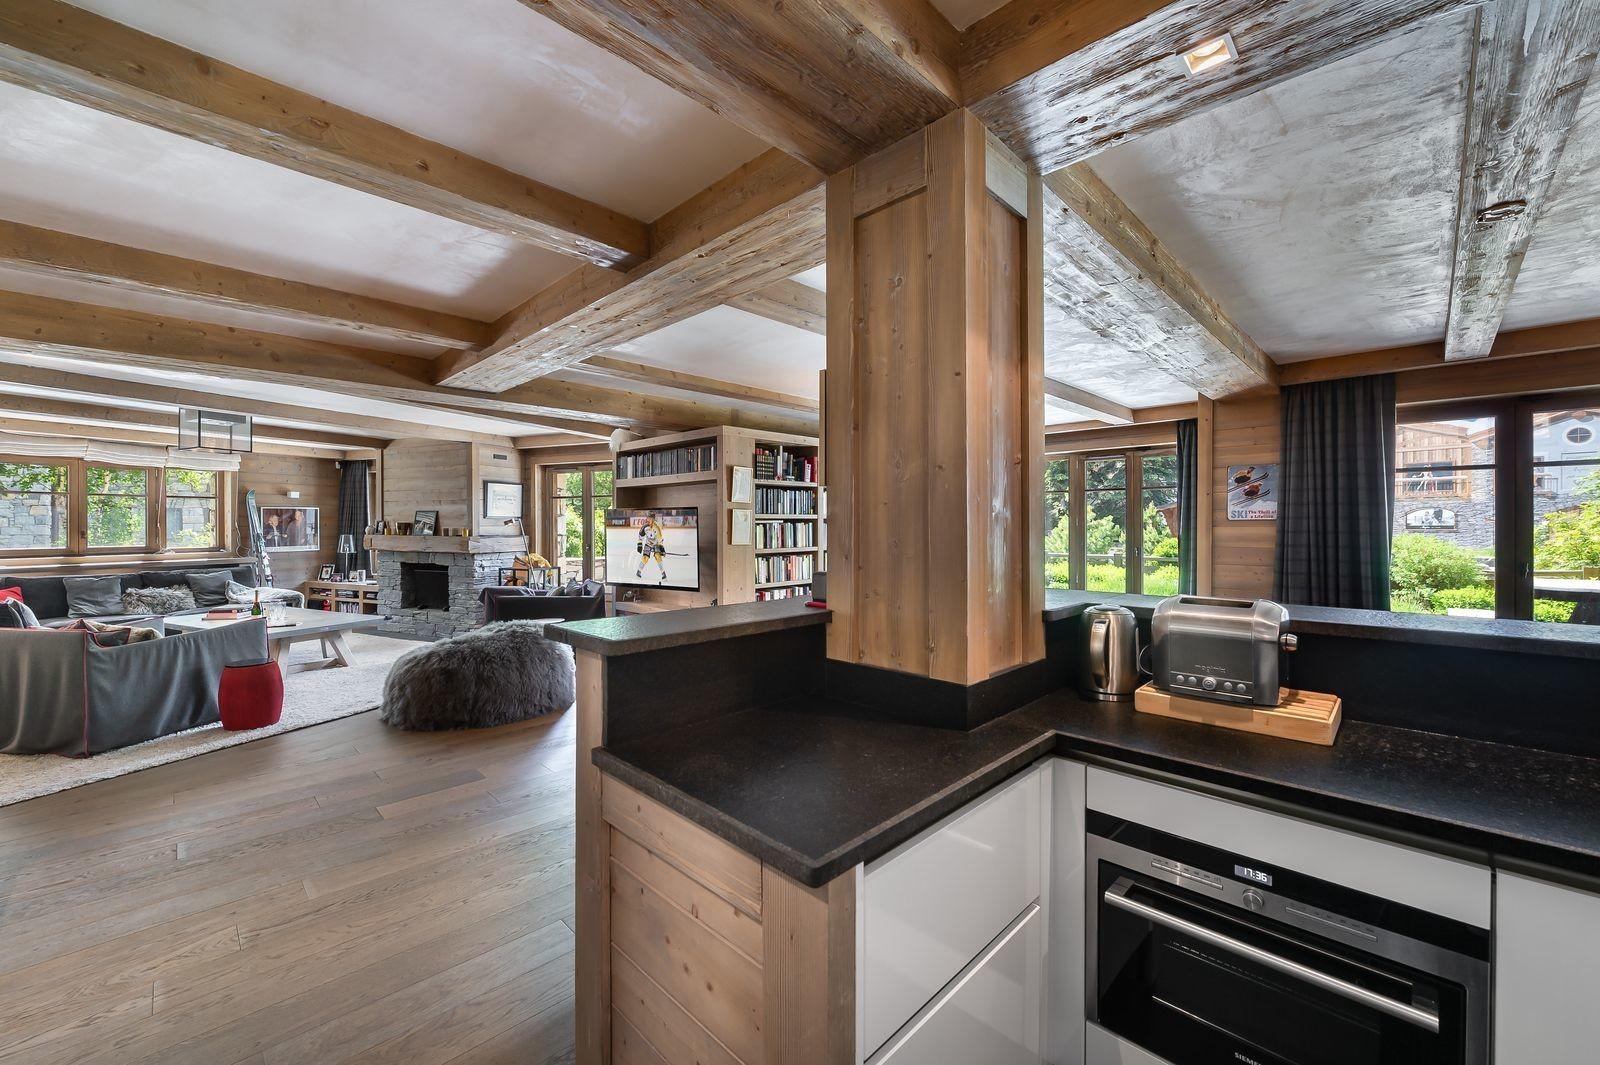 Val d'Isère Location Appartement Luxe Viorne Cuisine